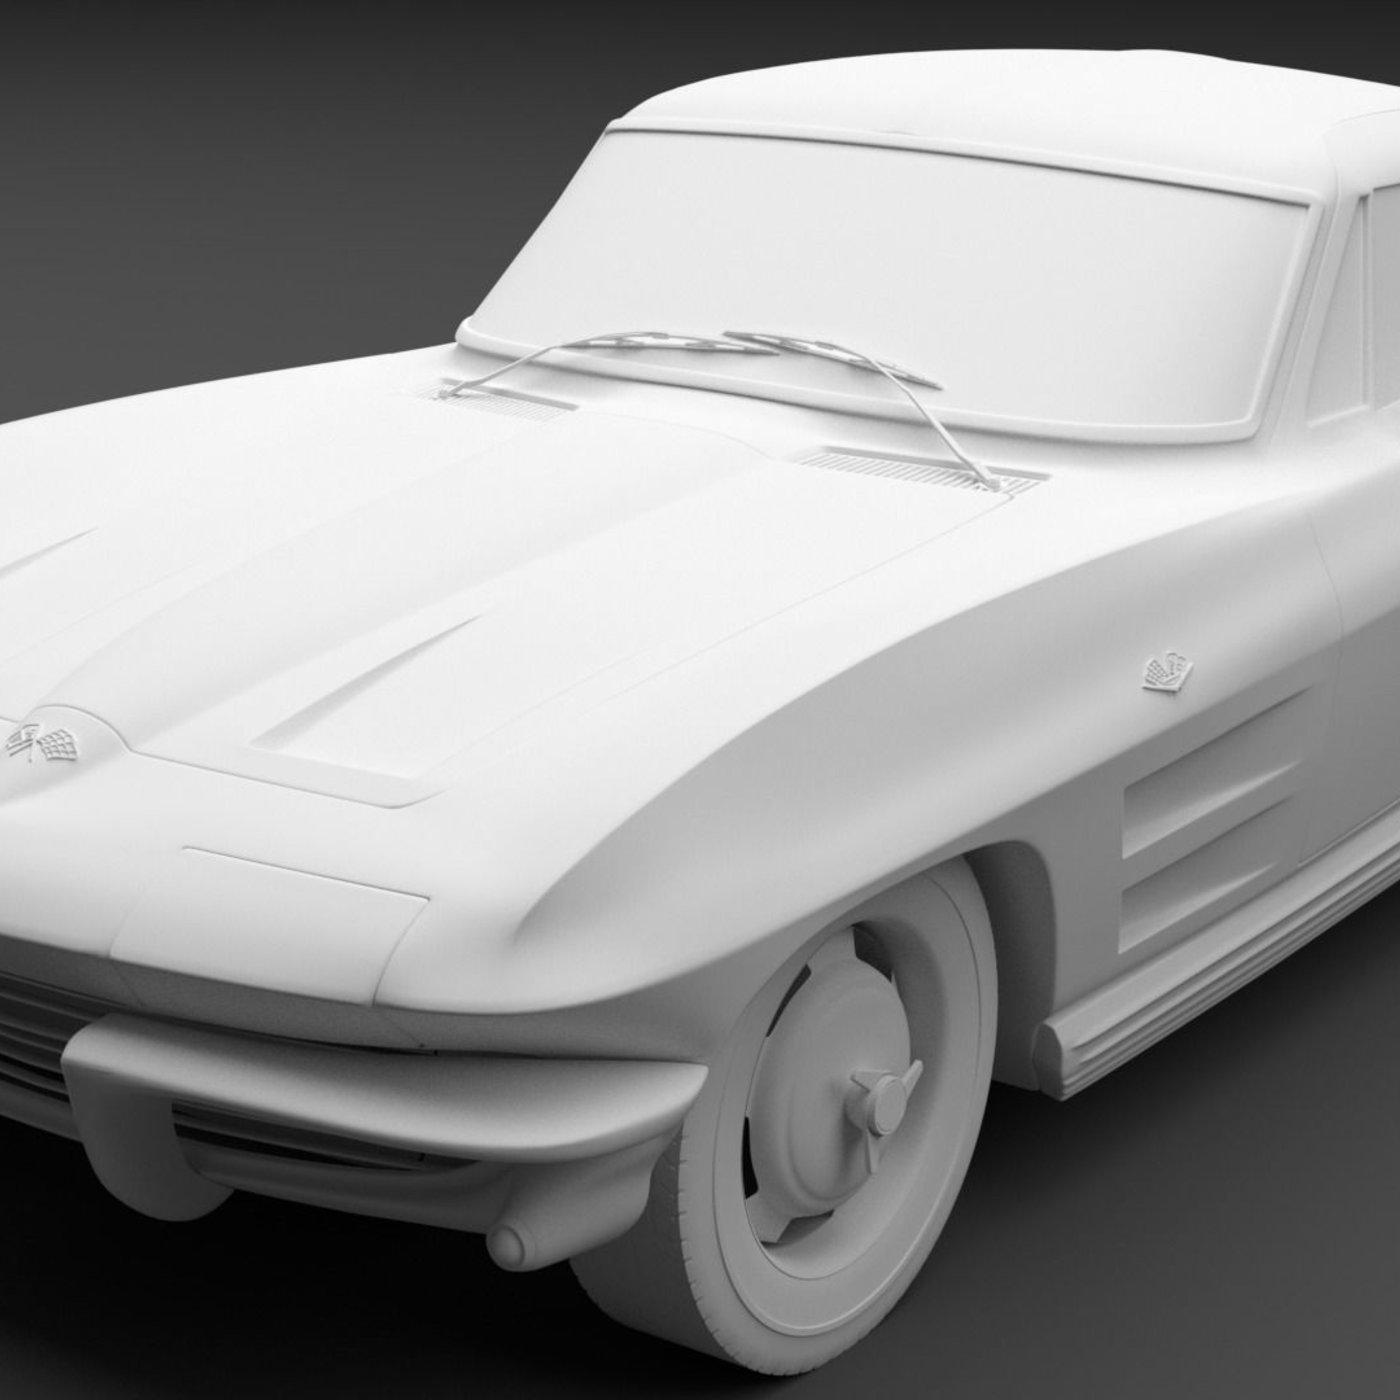 1964 chevrolet corvette stingray C2 coupe